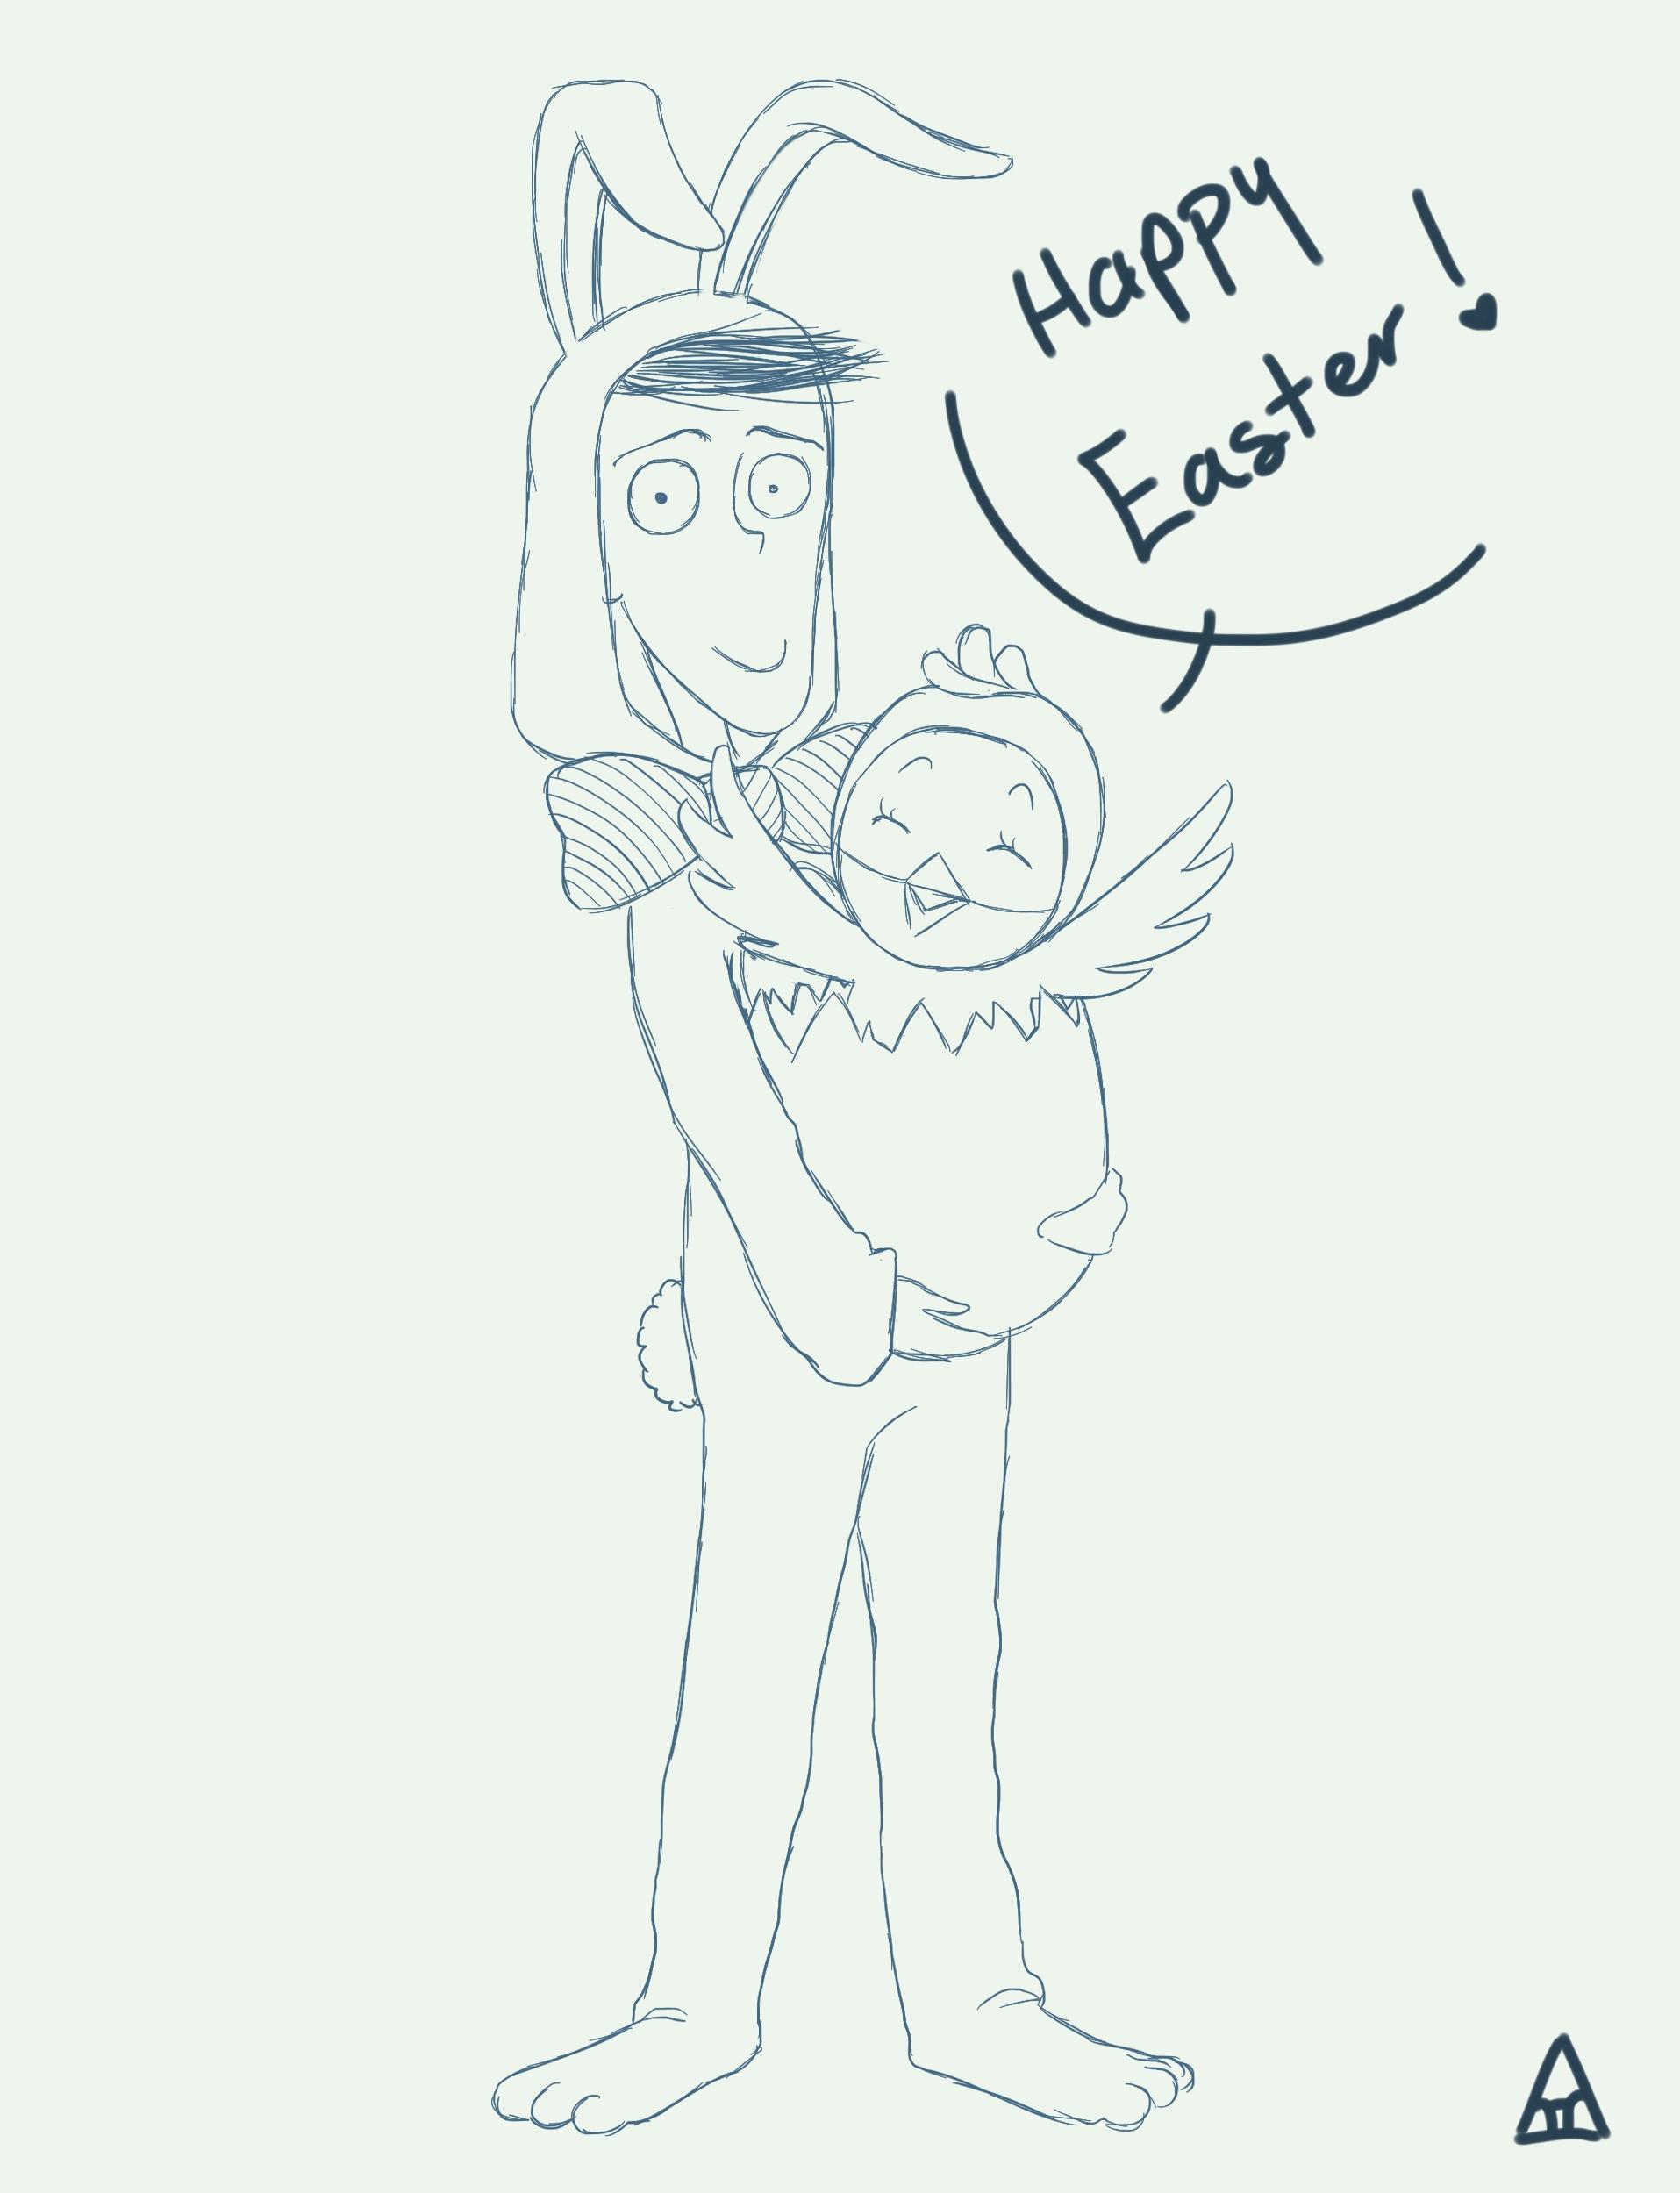 Happy Easter Sketch!